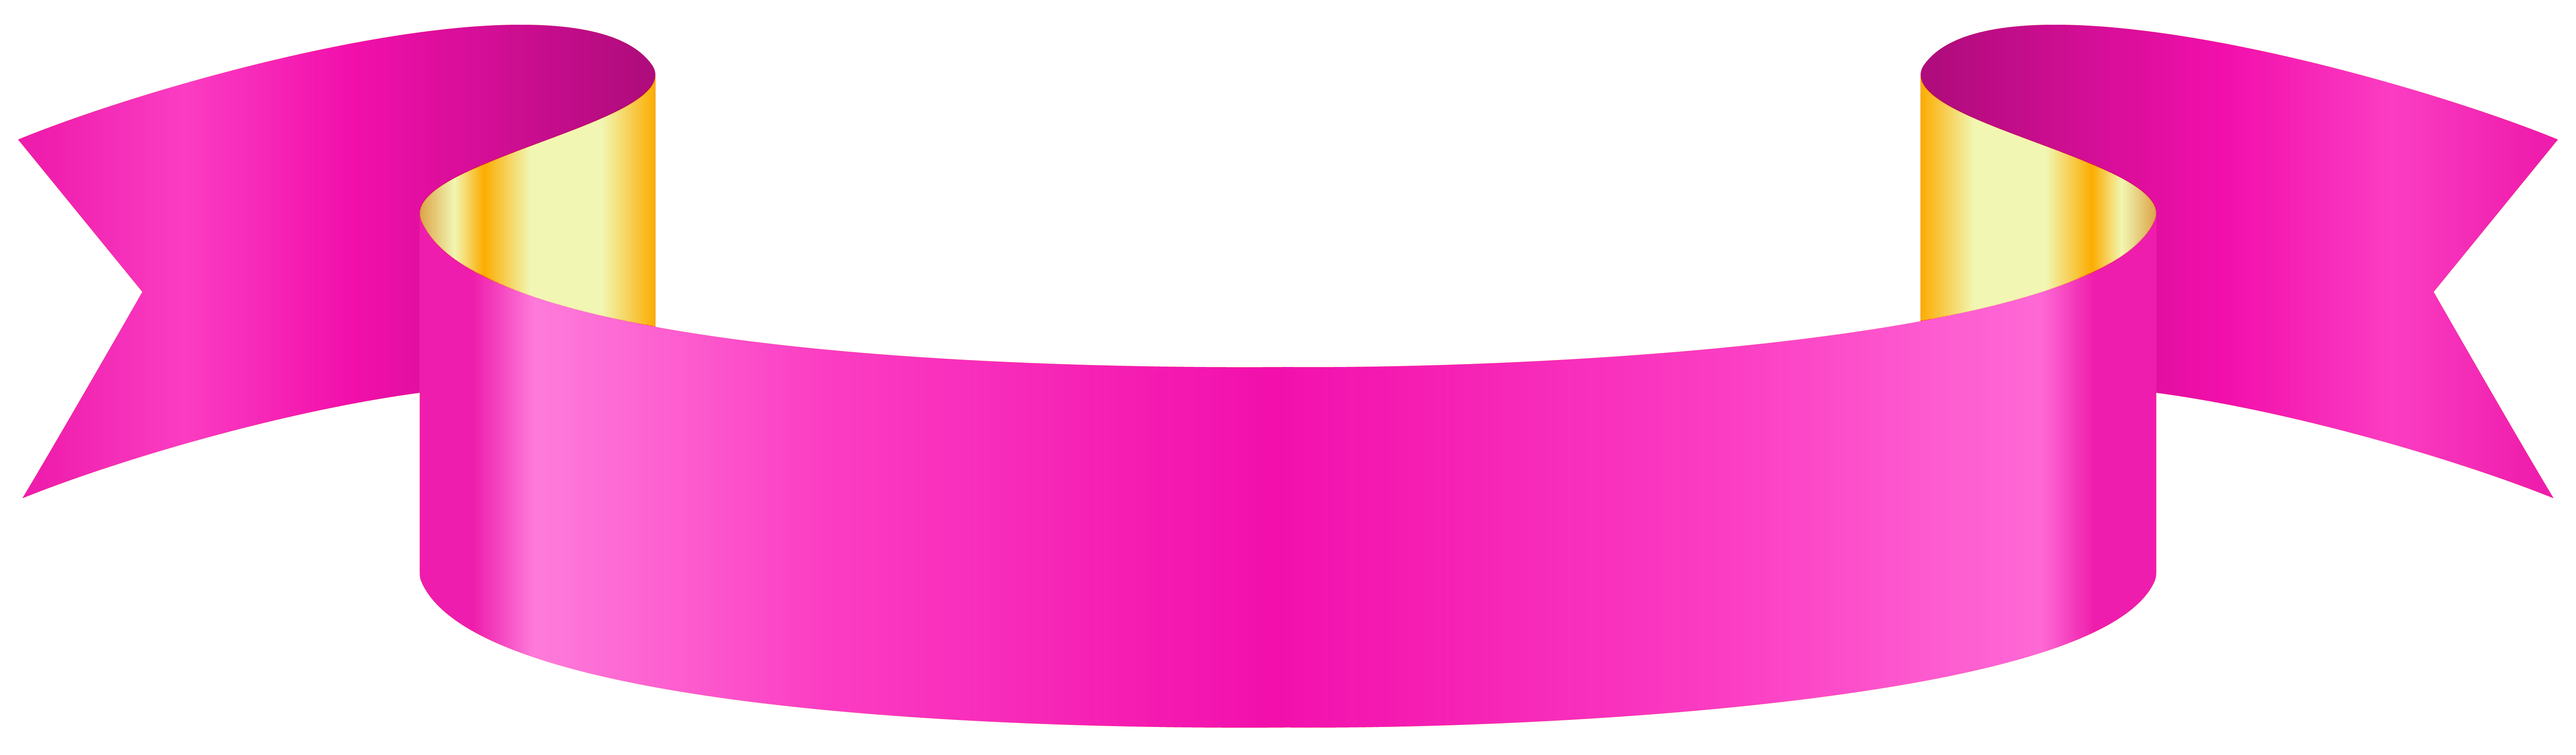 Banner transparent png clip. Diploma clipart pink